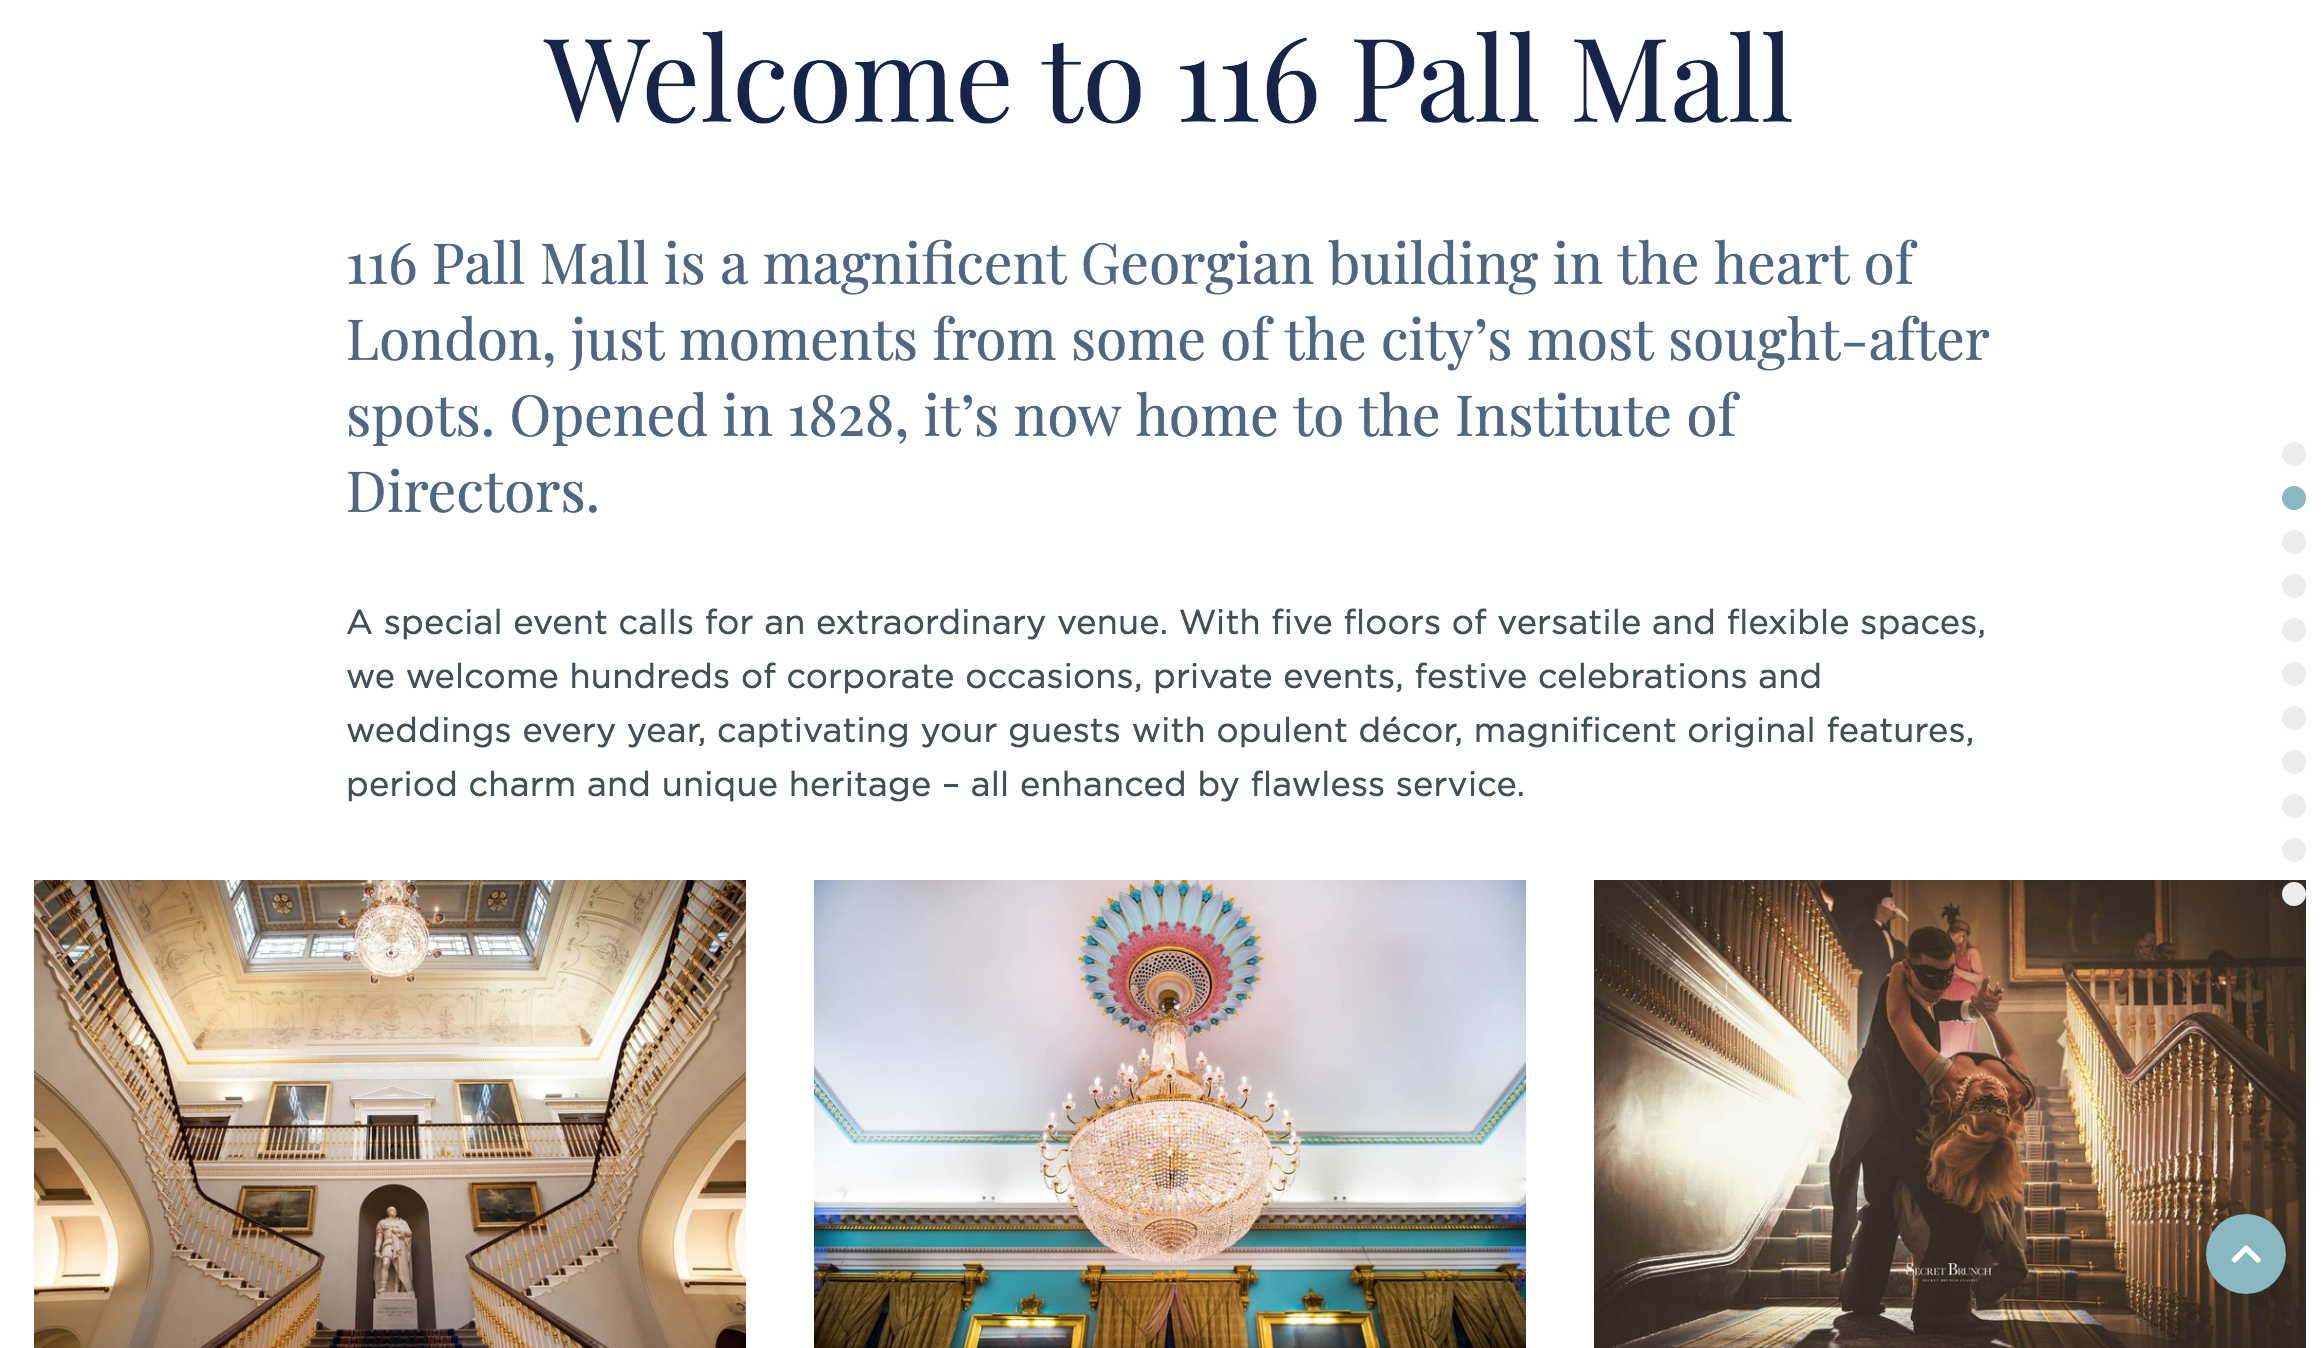 116 Pall Mall website